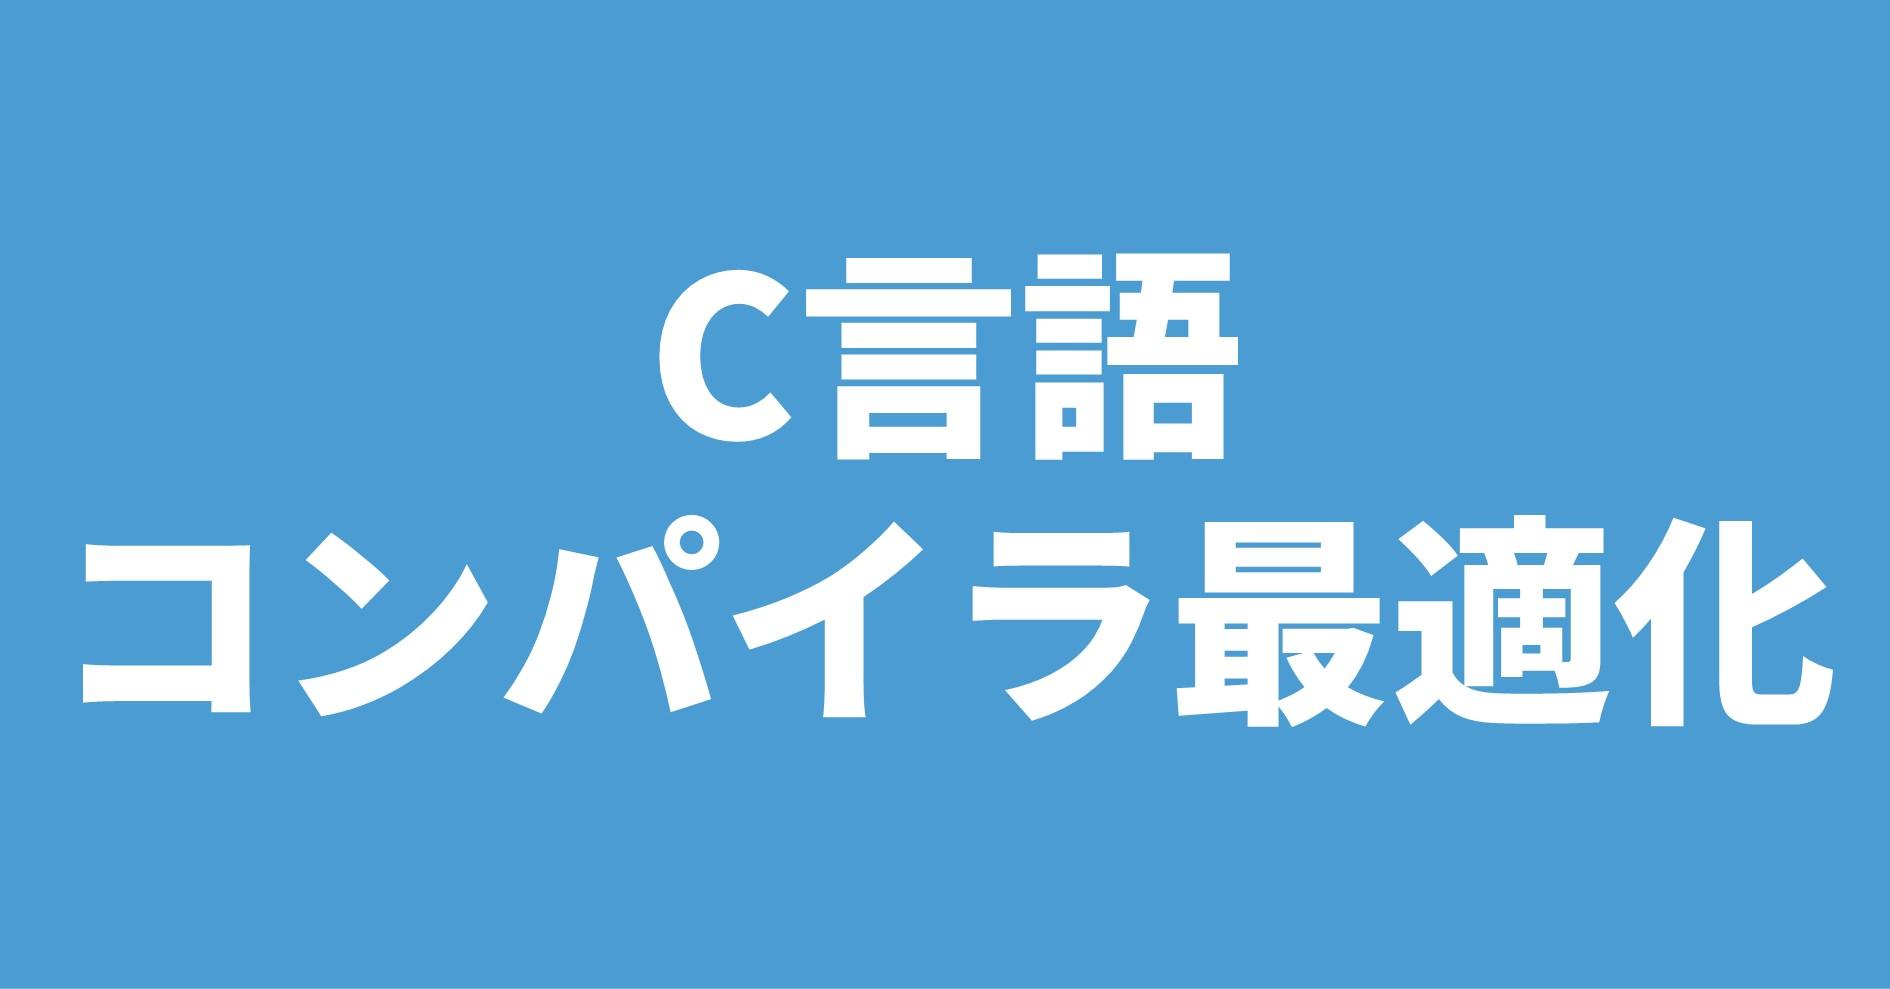 C言語 コンパイラ最適化